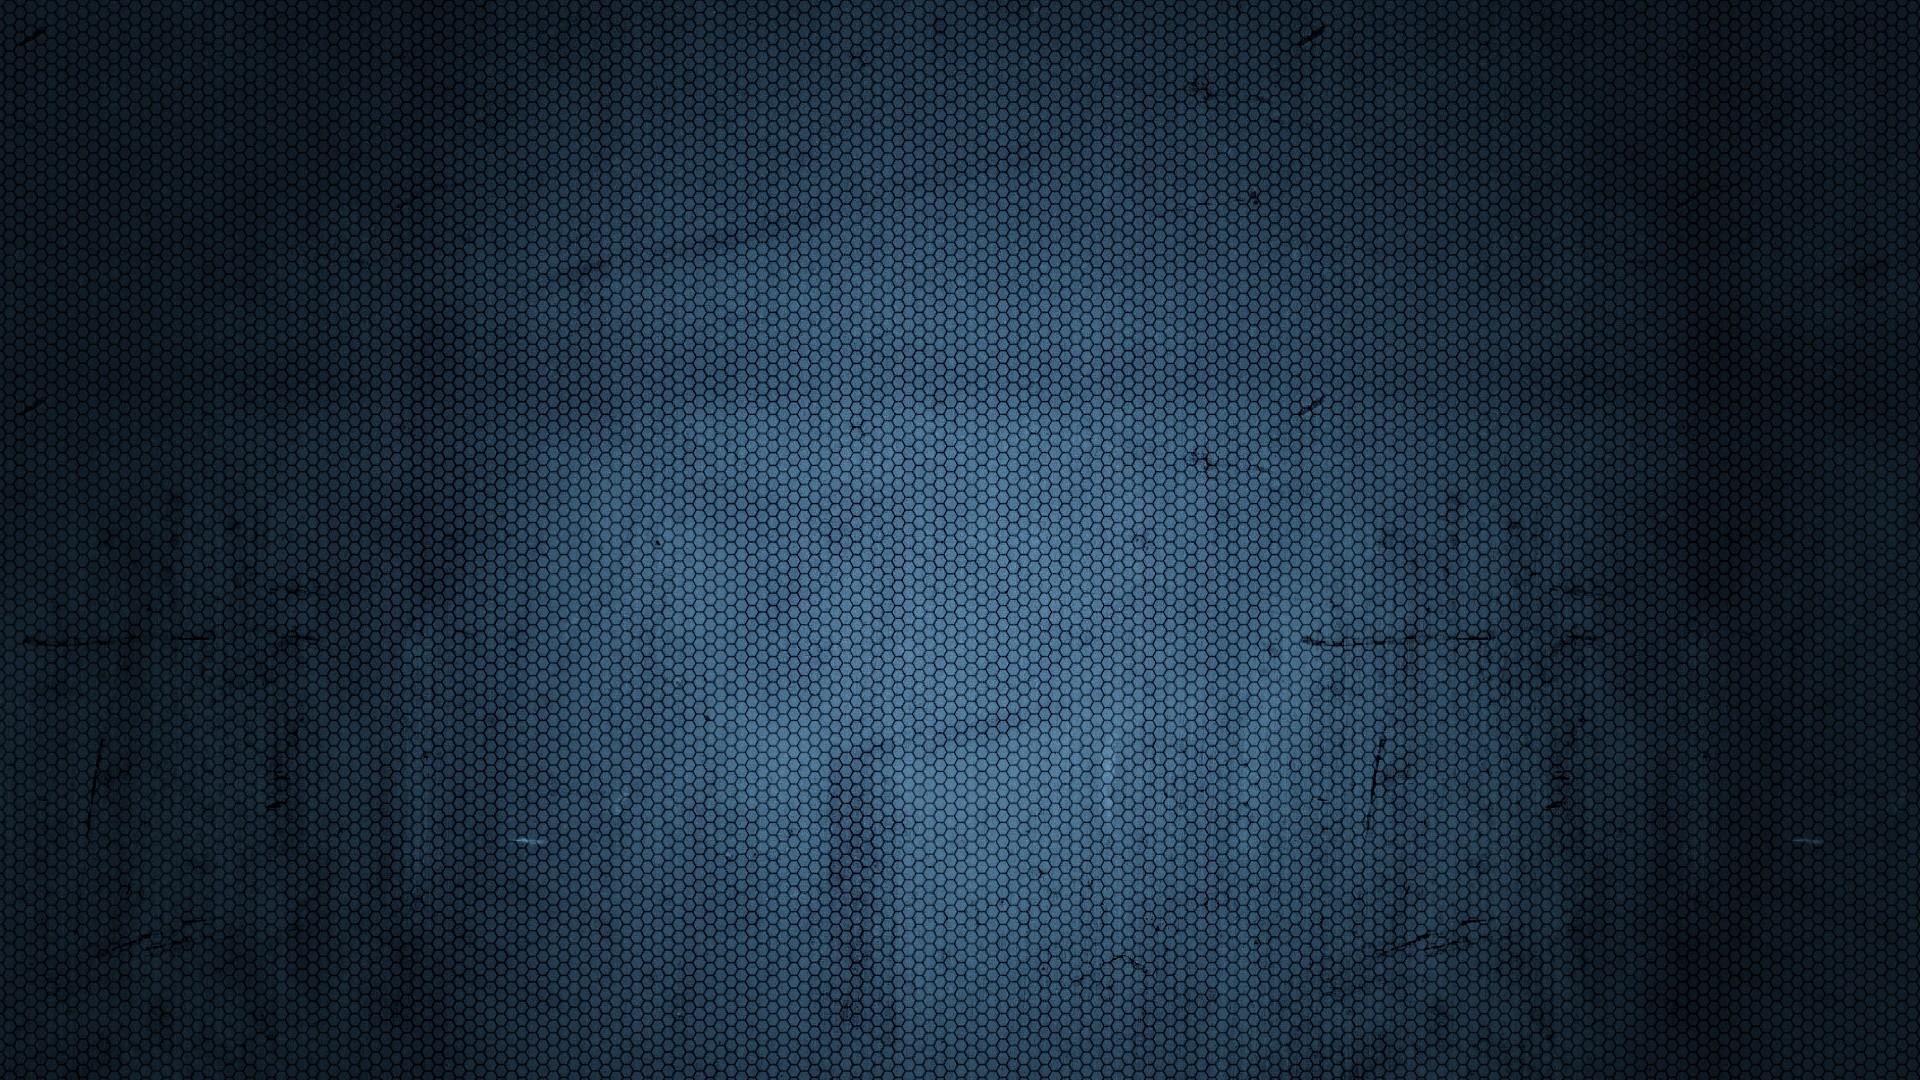 Carbon Fiber <b>Honeycomb Wallpaper</b> by <b>HD